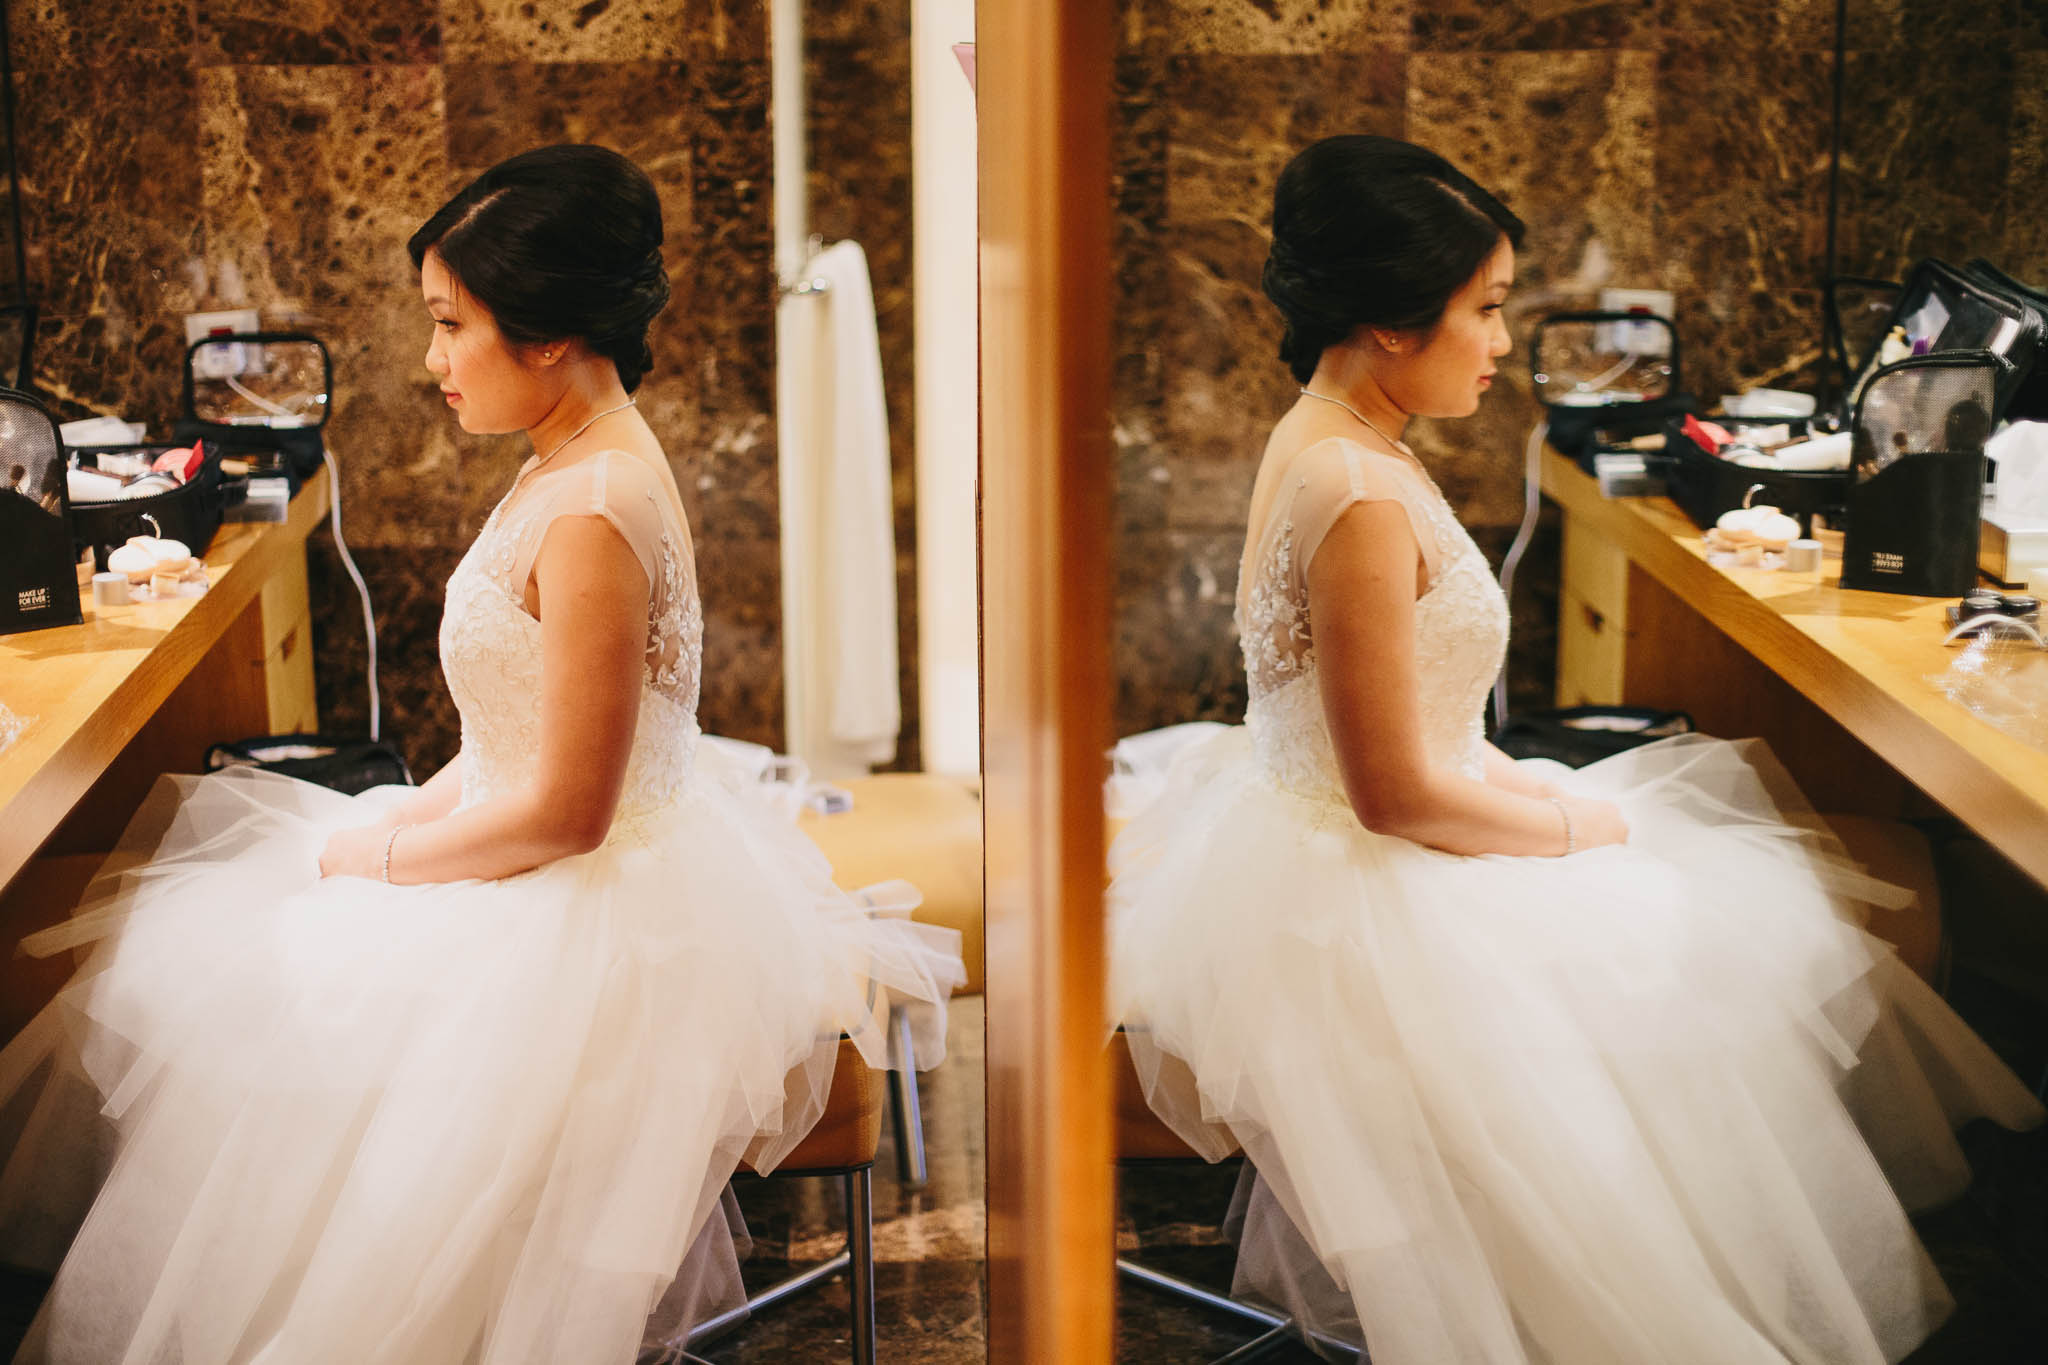 singapore-wedding-photographer-malay-indian-pre-wedding-travel-wmt-2015-jeremy-larissa-10.jpg